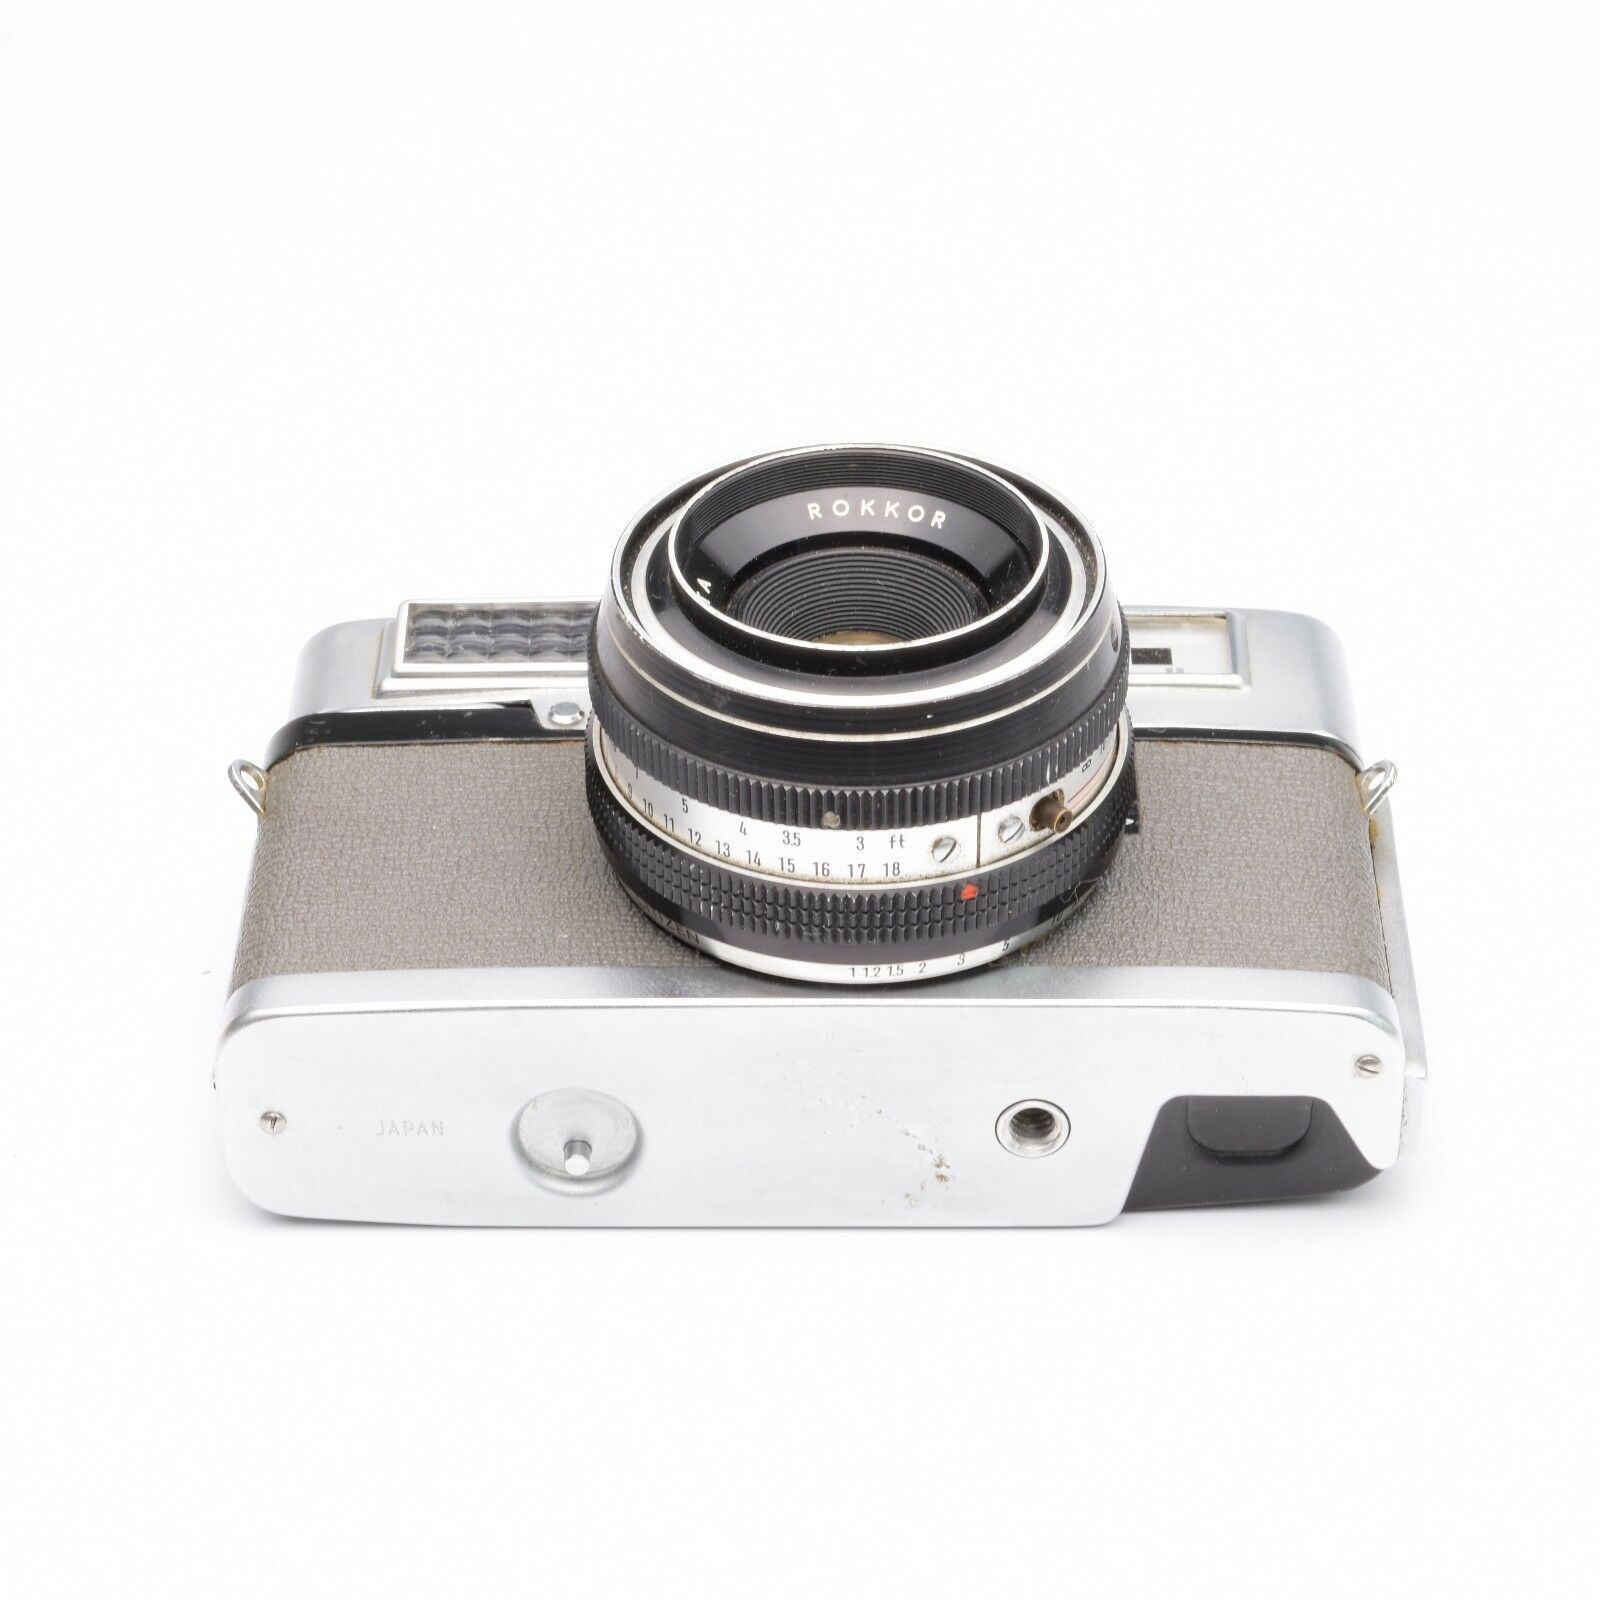 Minolta Uniomat Camera with Rokkor 45mm f/2.8 Lens c.1960-61